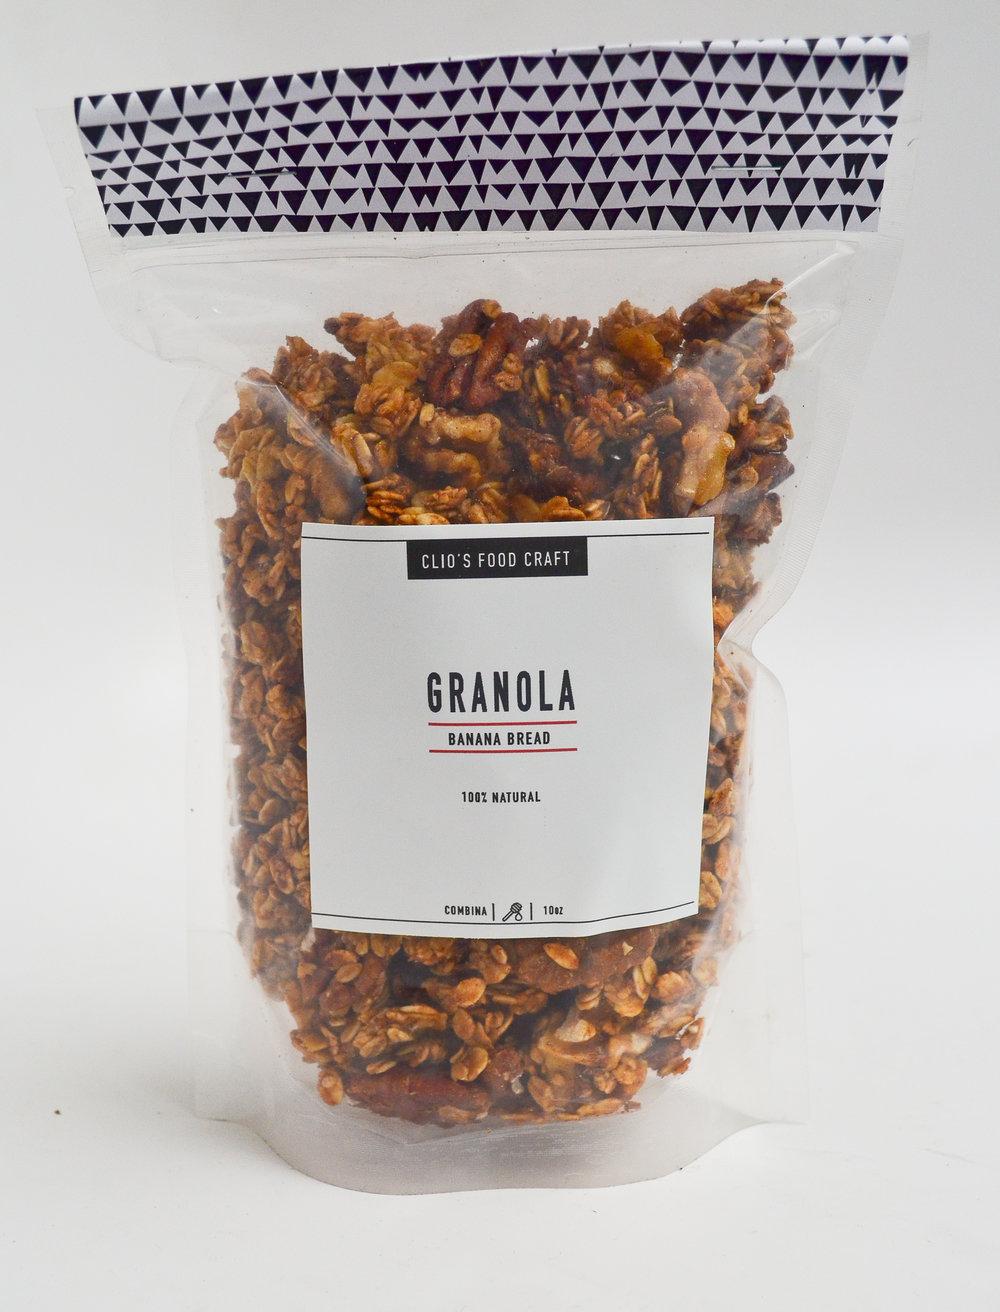 BANANA BREAD - Q.80   10oz